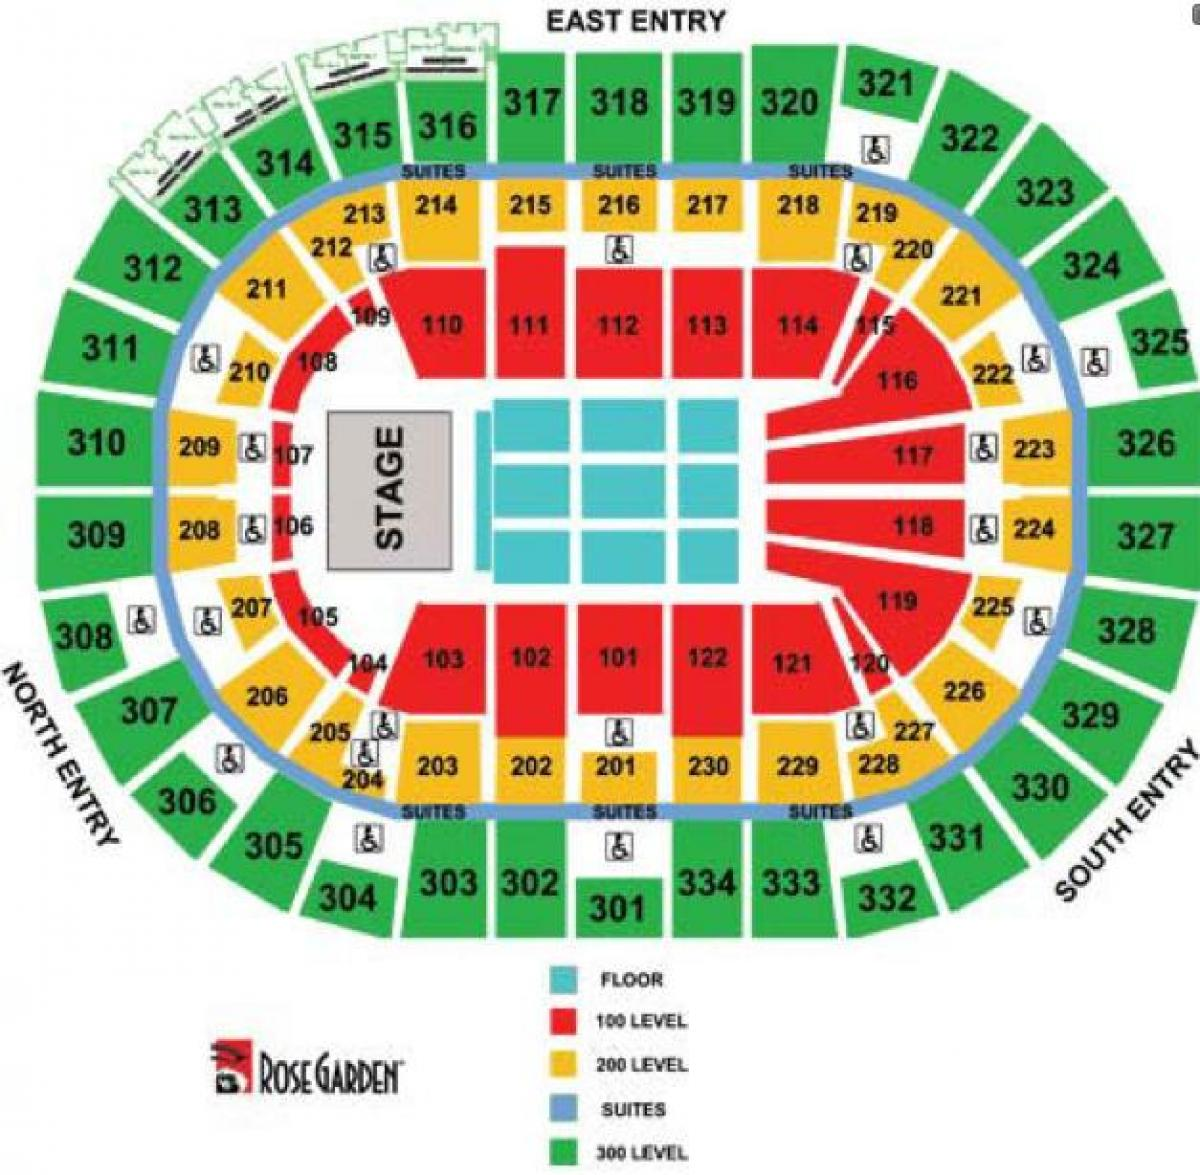 Moda Center Concert Seating Map